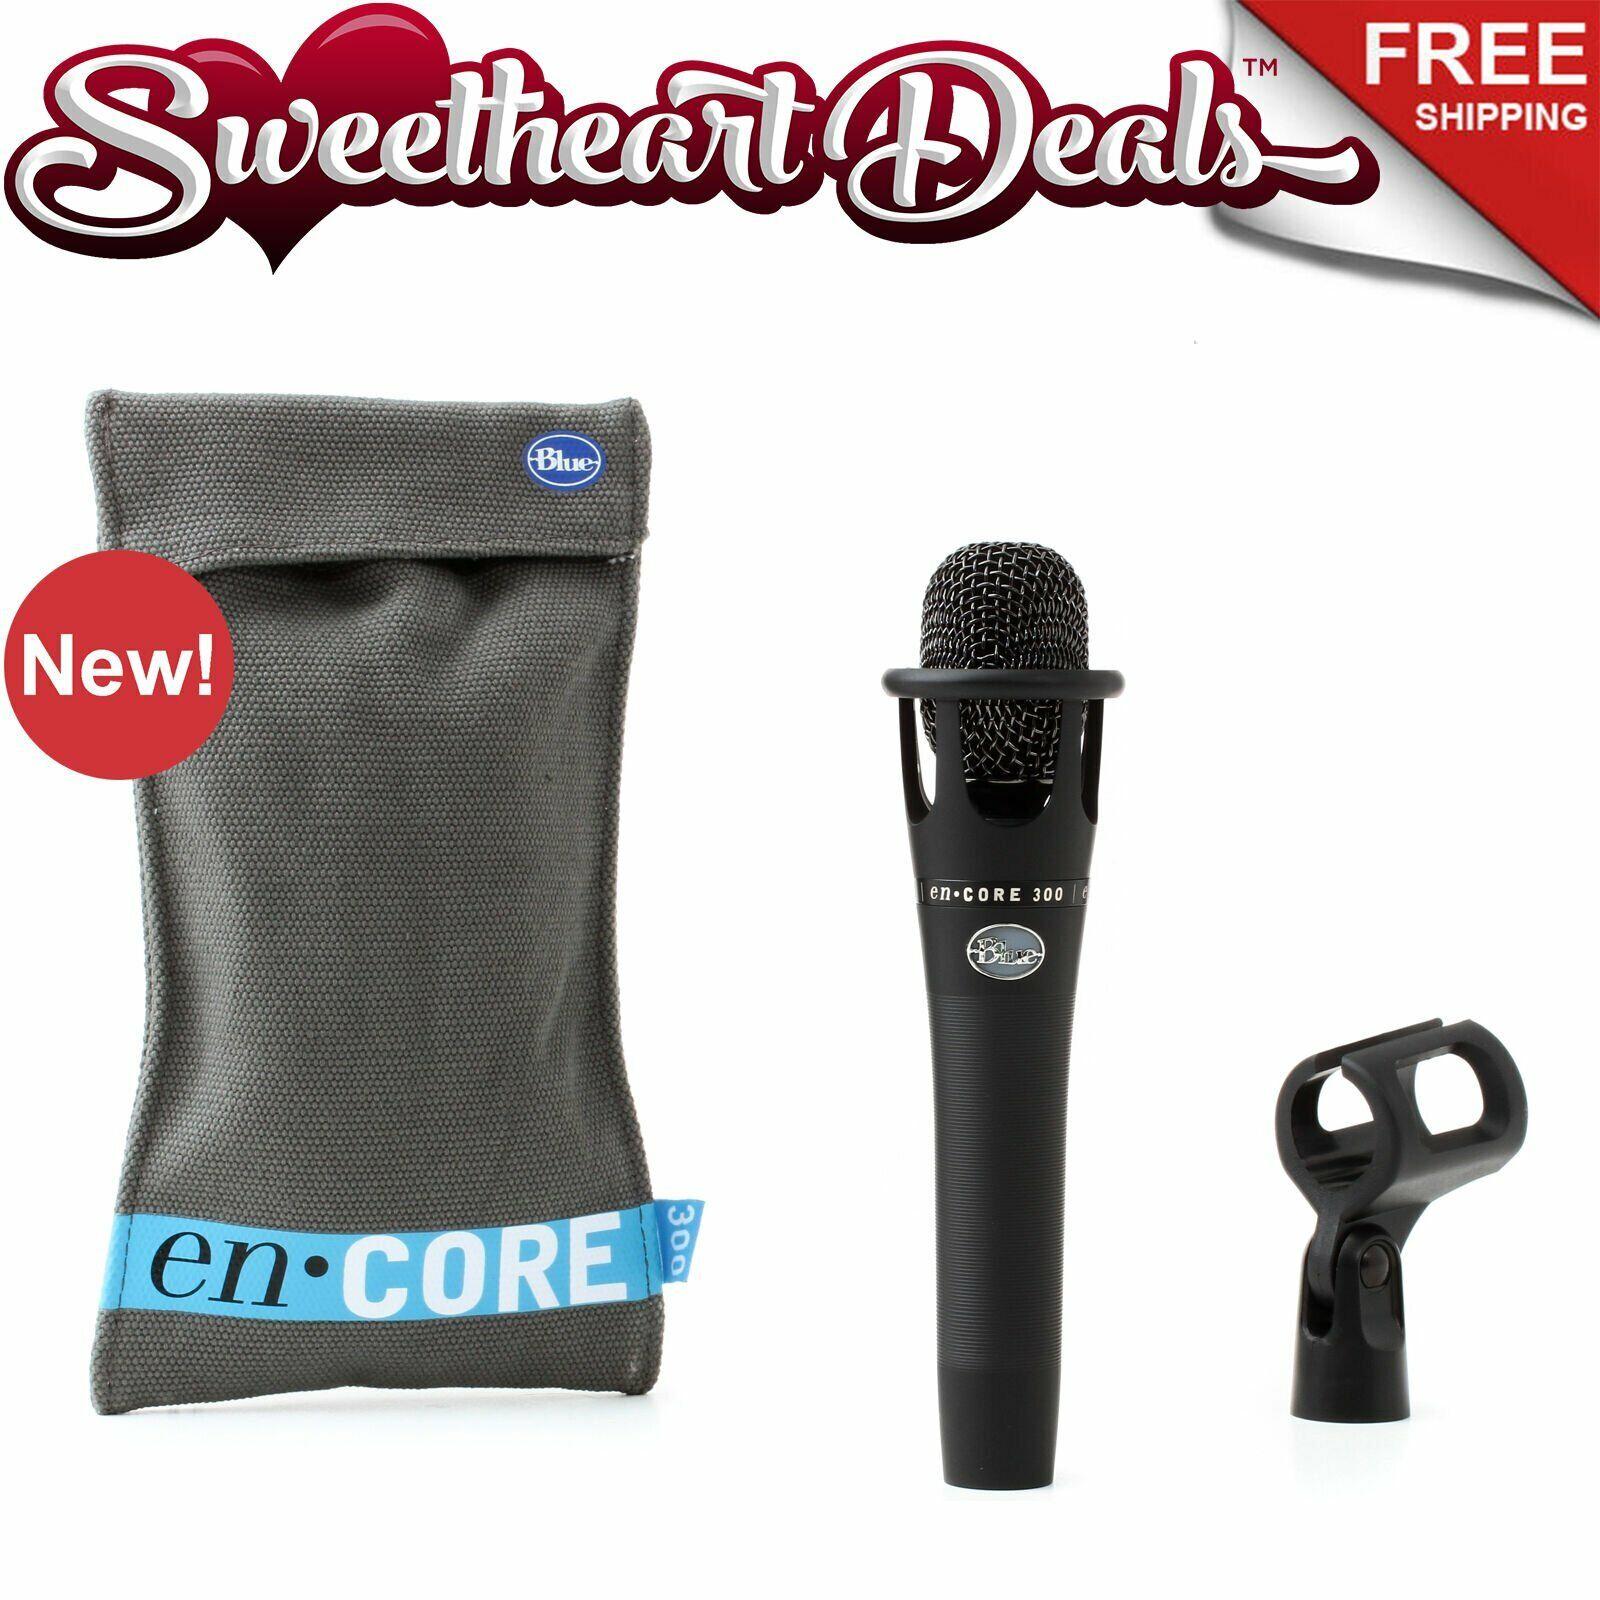 Blau Microphones enCORE 300 schwarz - Active Dynamic Handheld Microphone